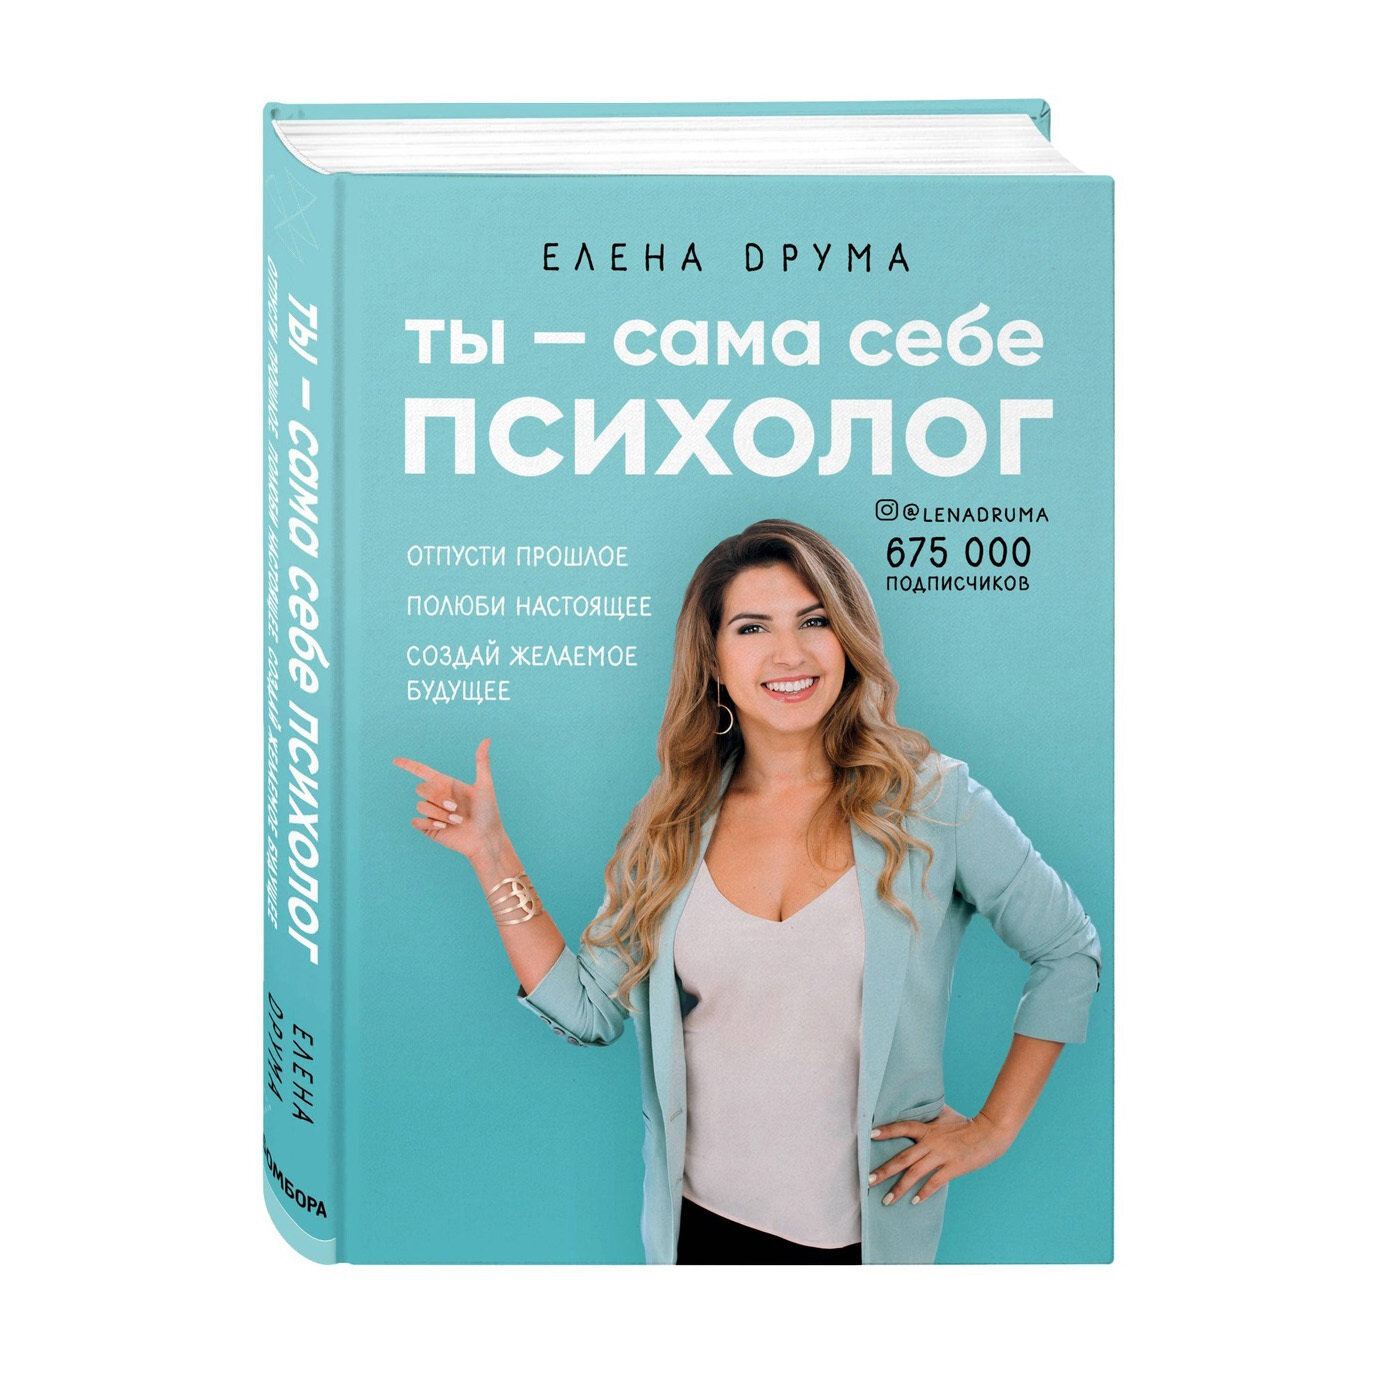 Книга Ты сама себе психолог